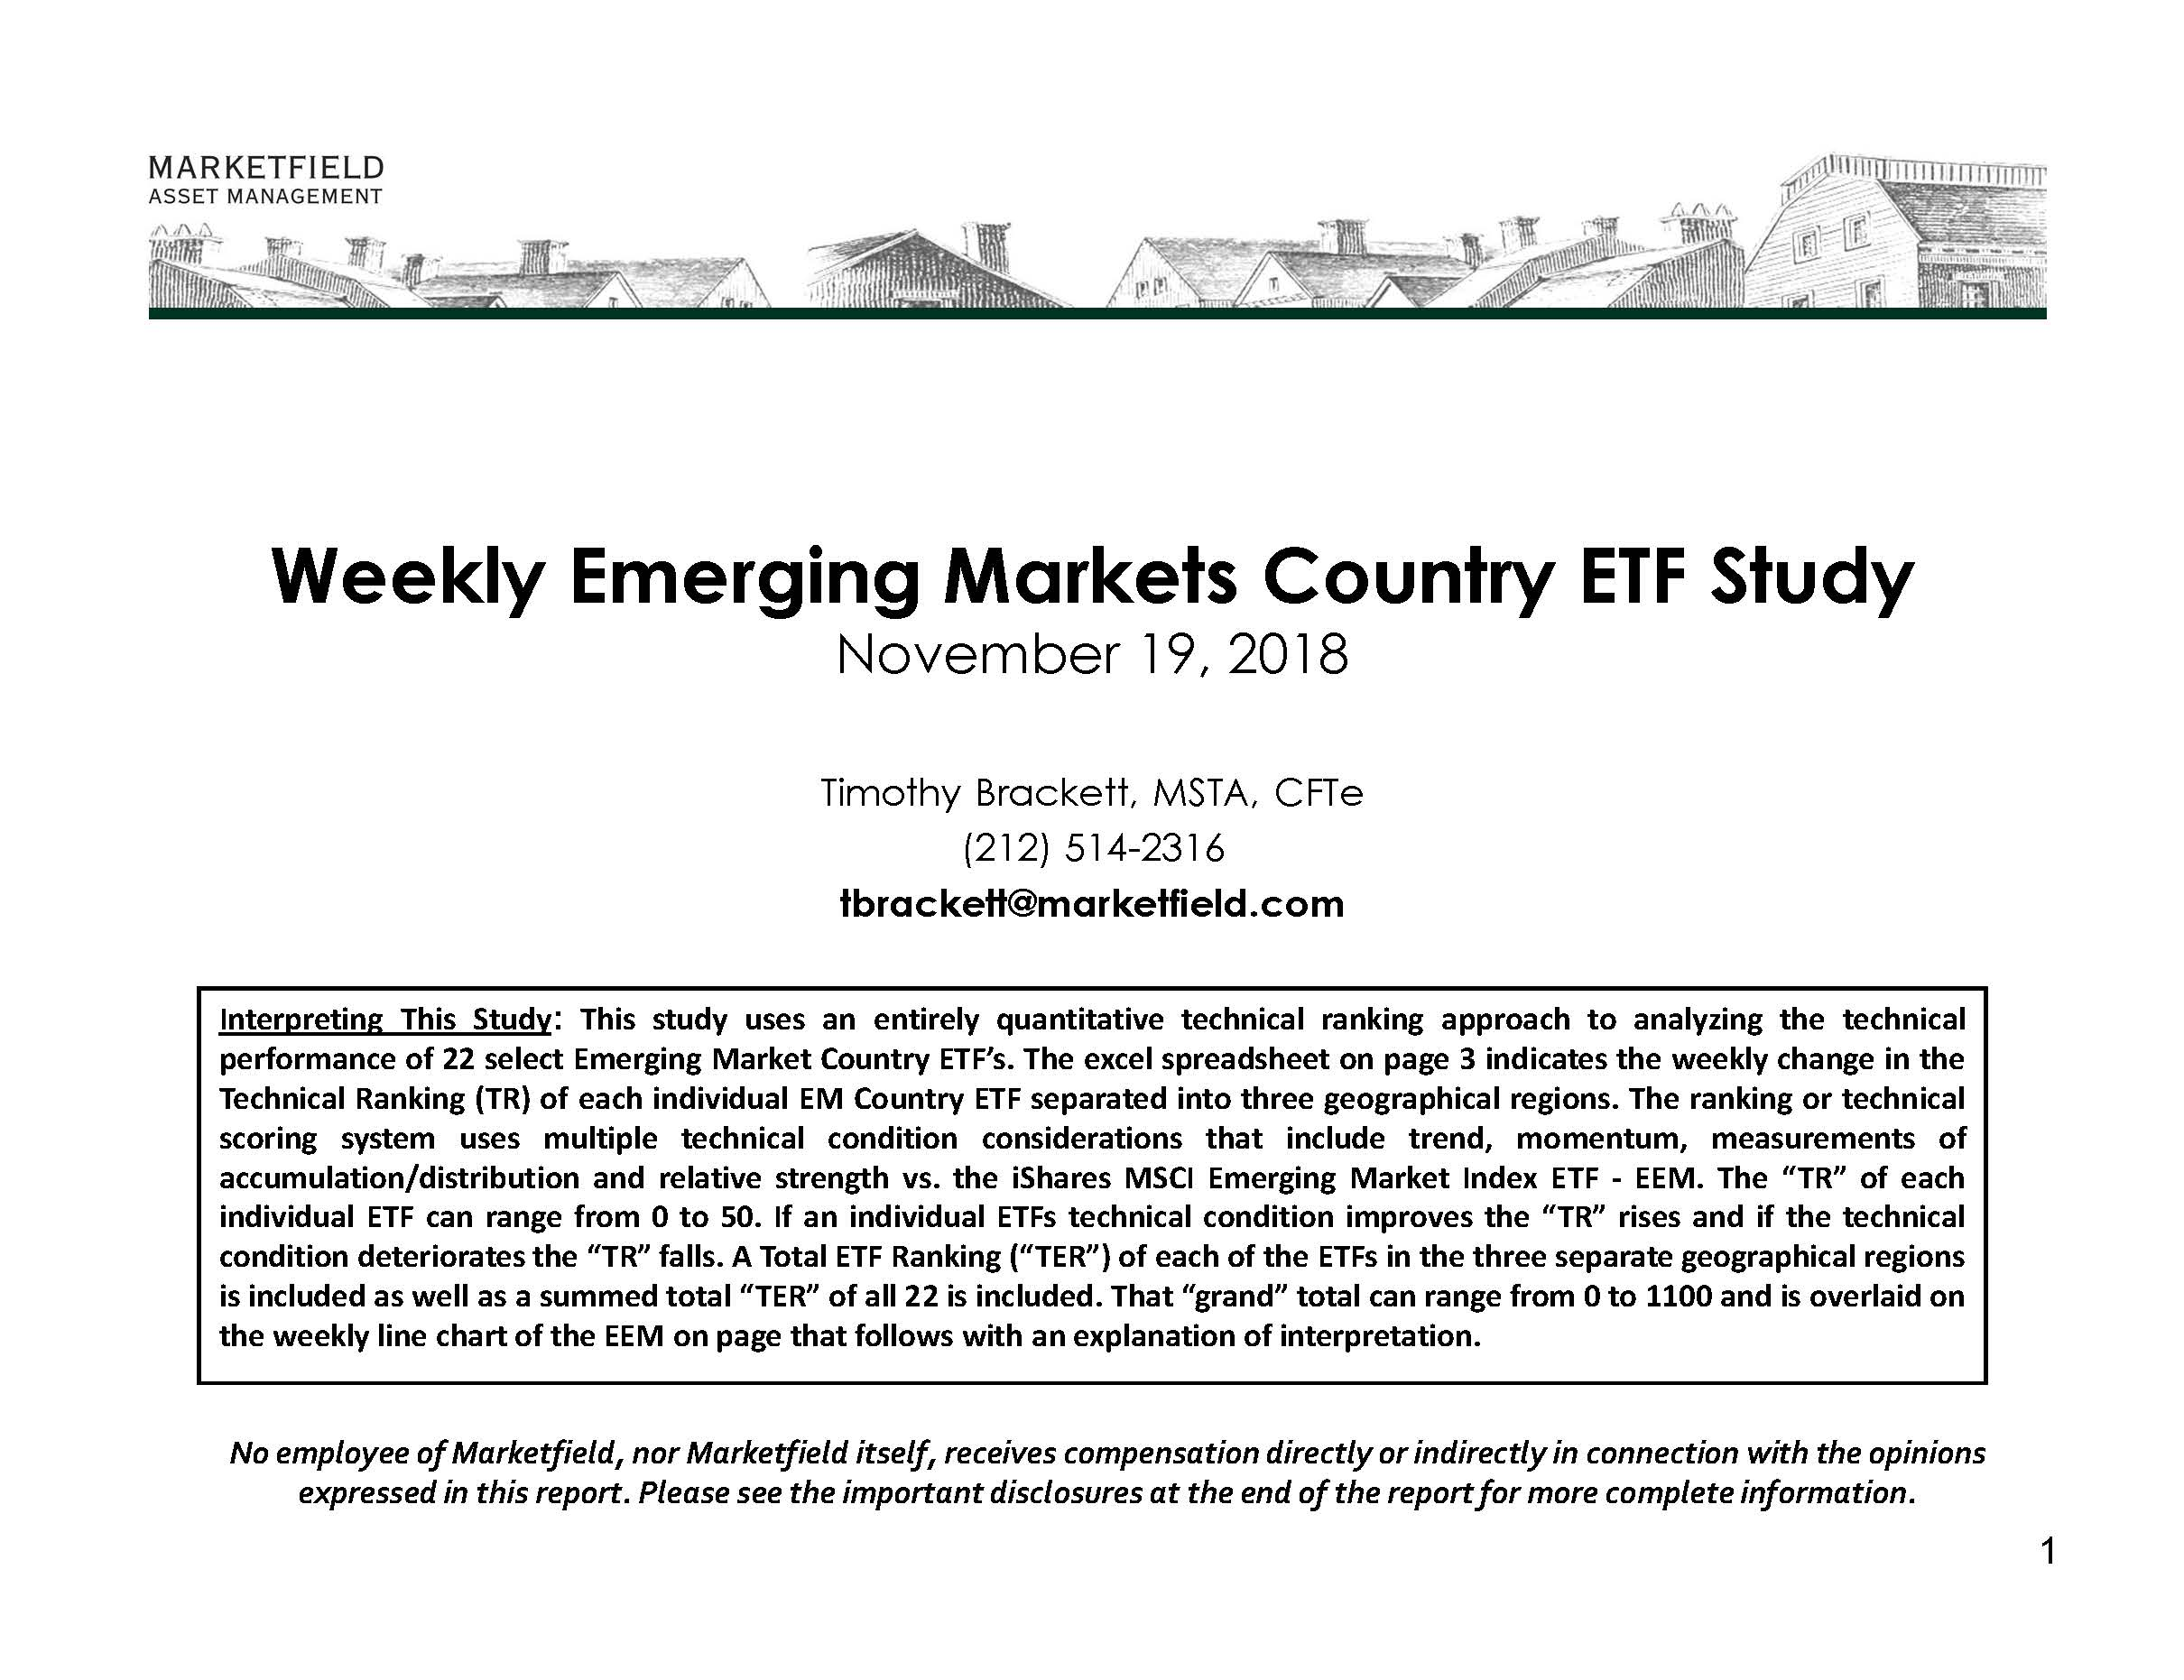 11-19-18_EM ETF_Page_1.jpg